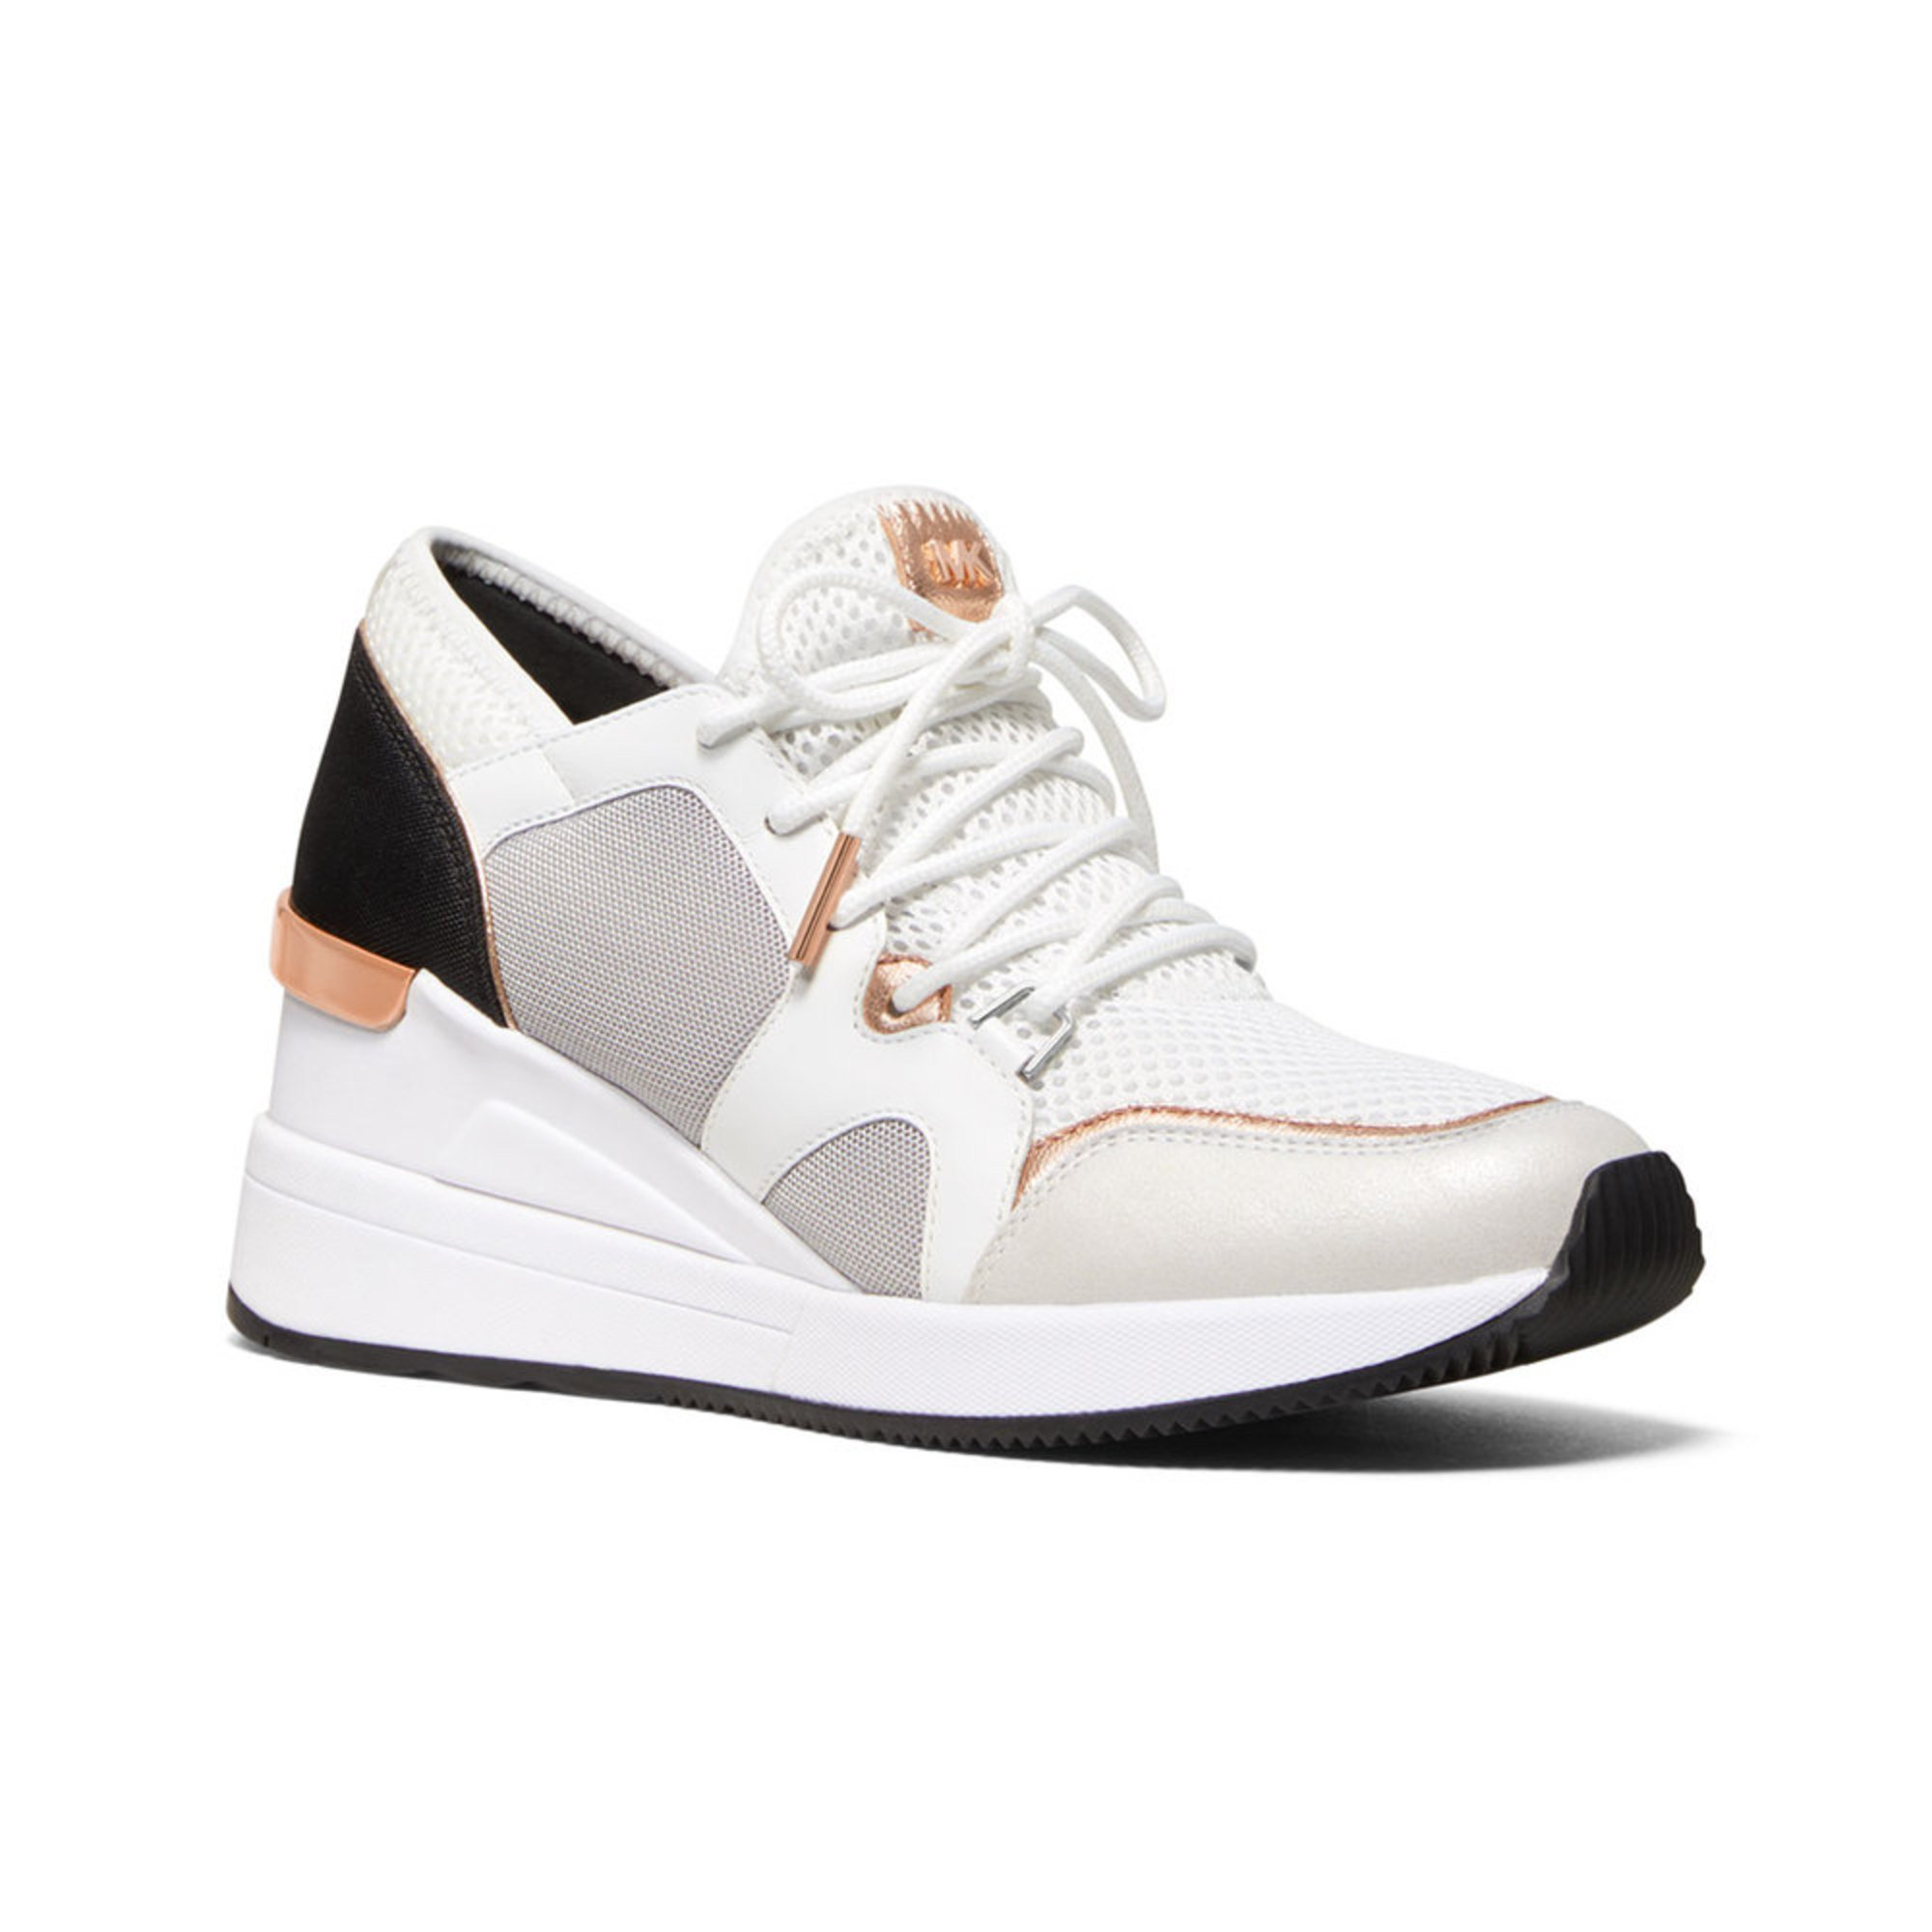 944afaf4e55e3 Michael Kors Women s Liv Trainer Sneaker